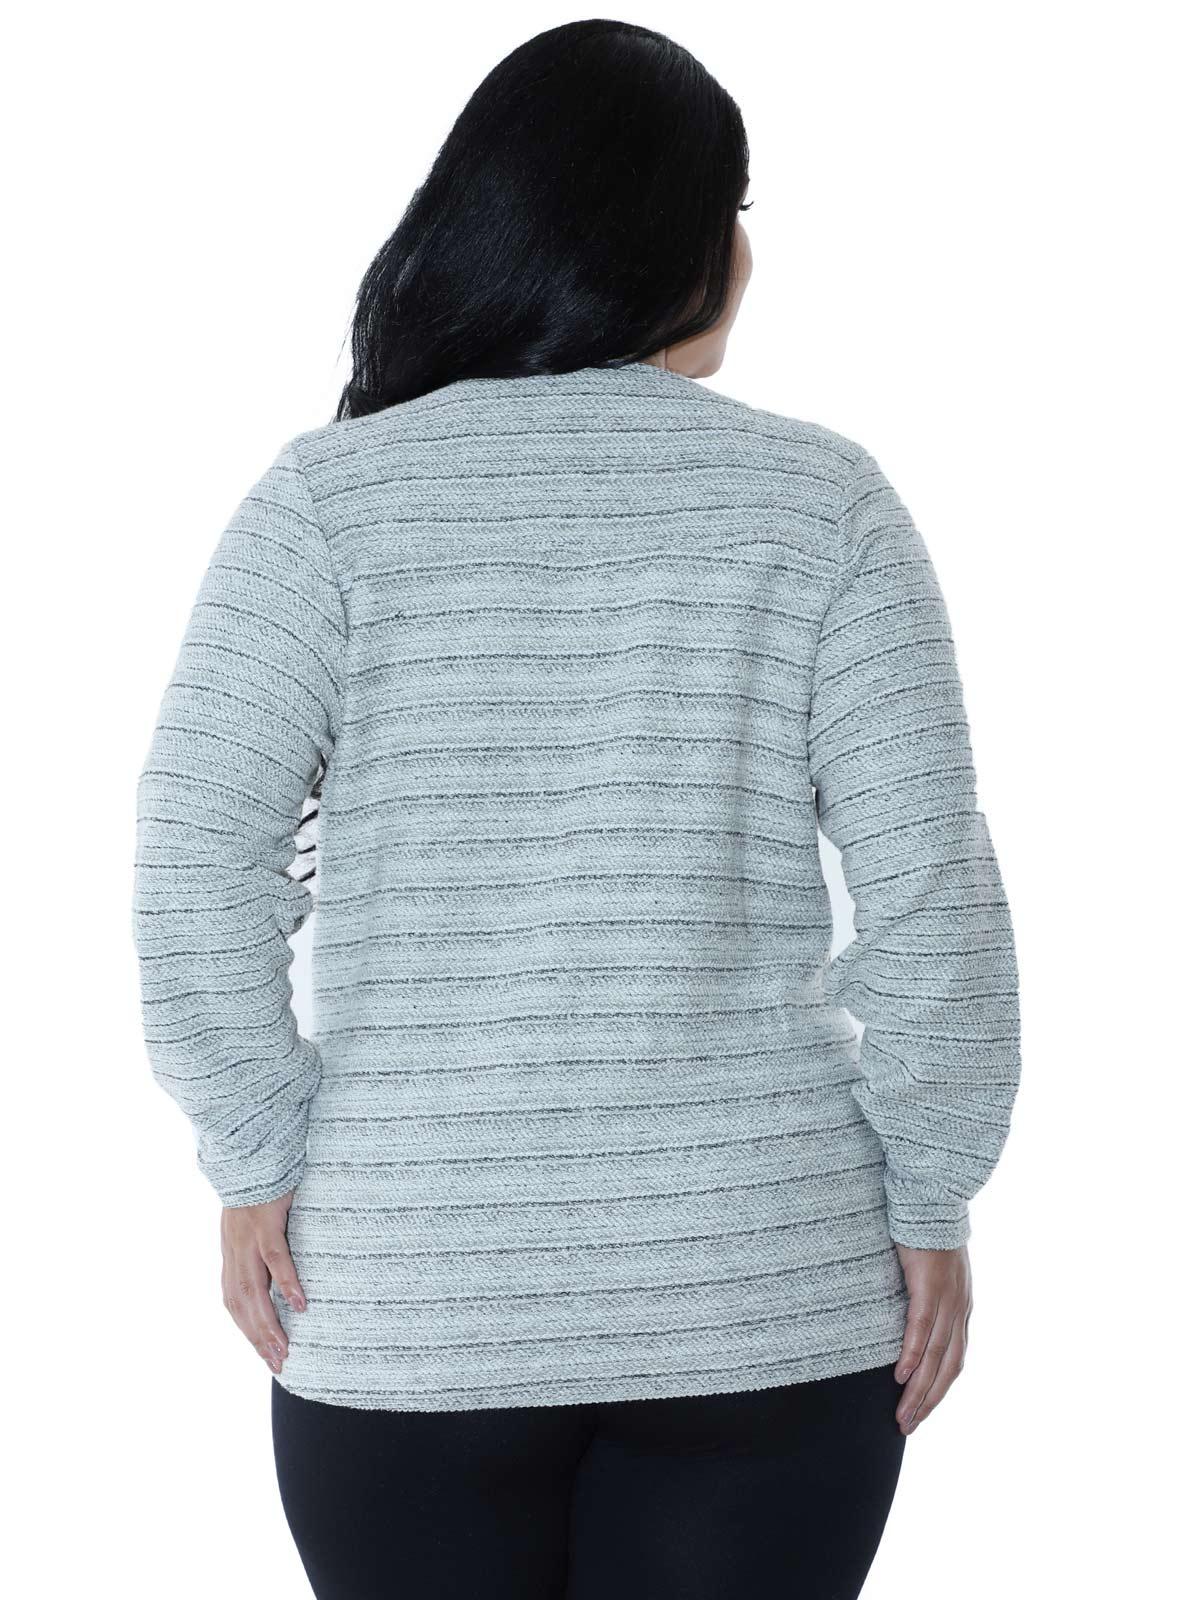 Casaco Plus Size Fleece Tricot Colors Preto